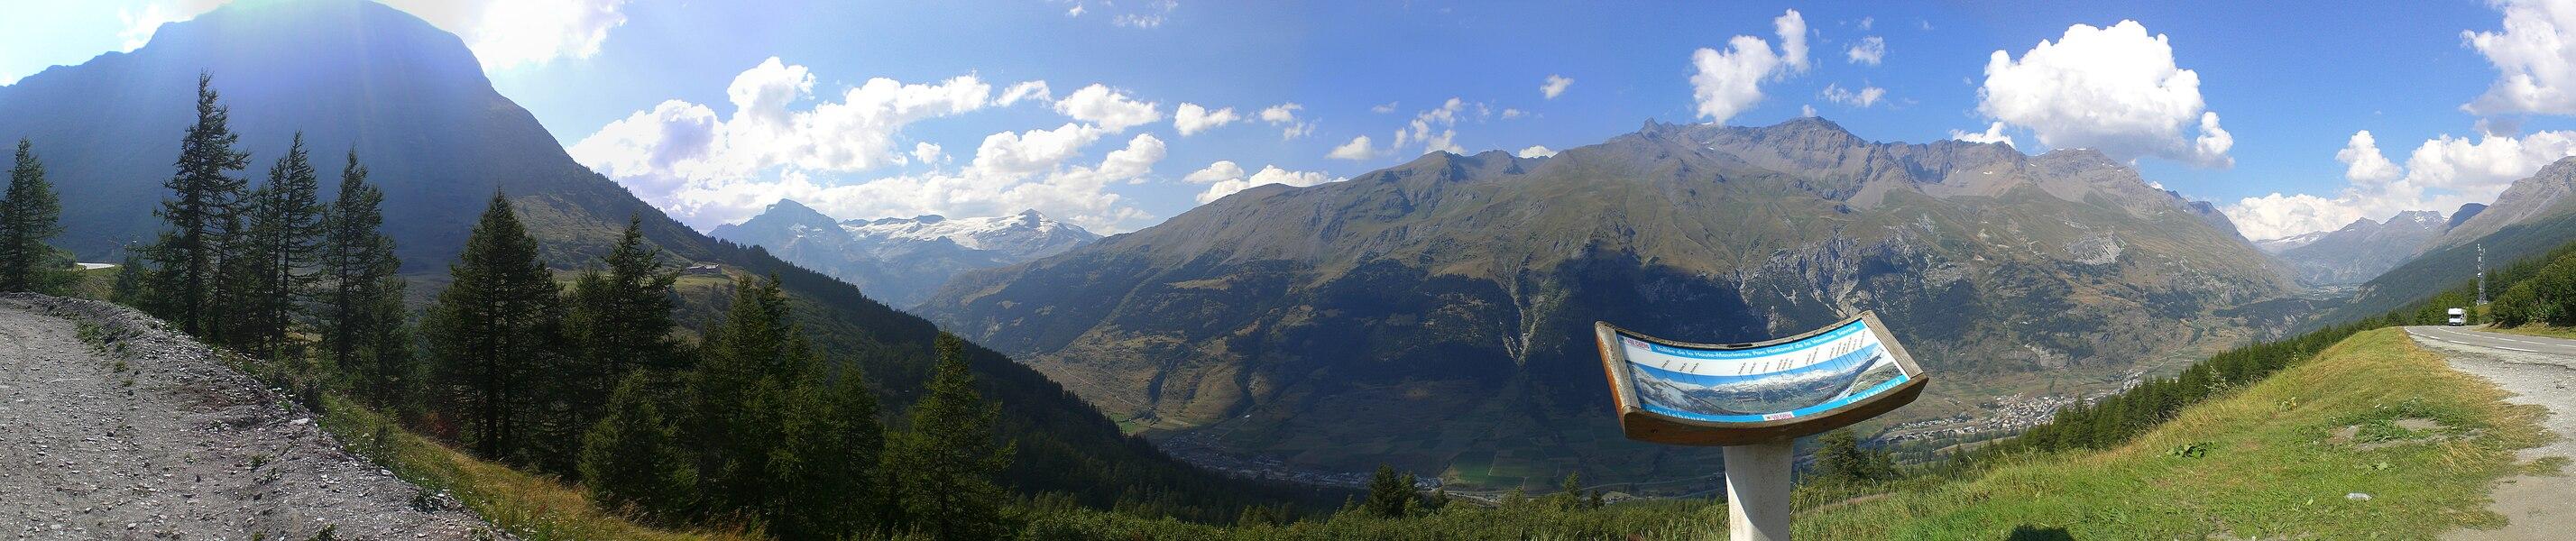 Haute-Maurienne valley, Rhône-Alpes, France.